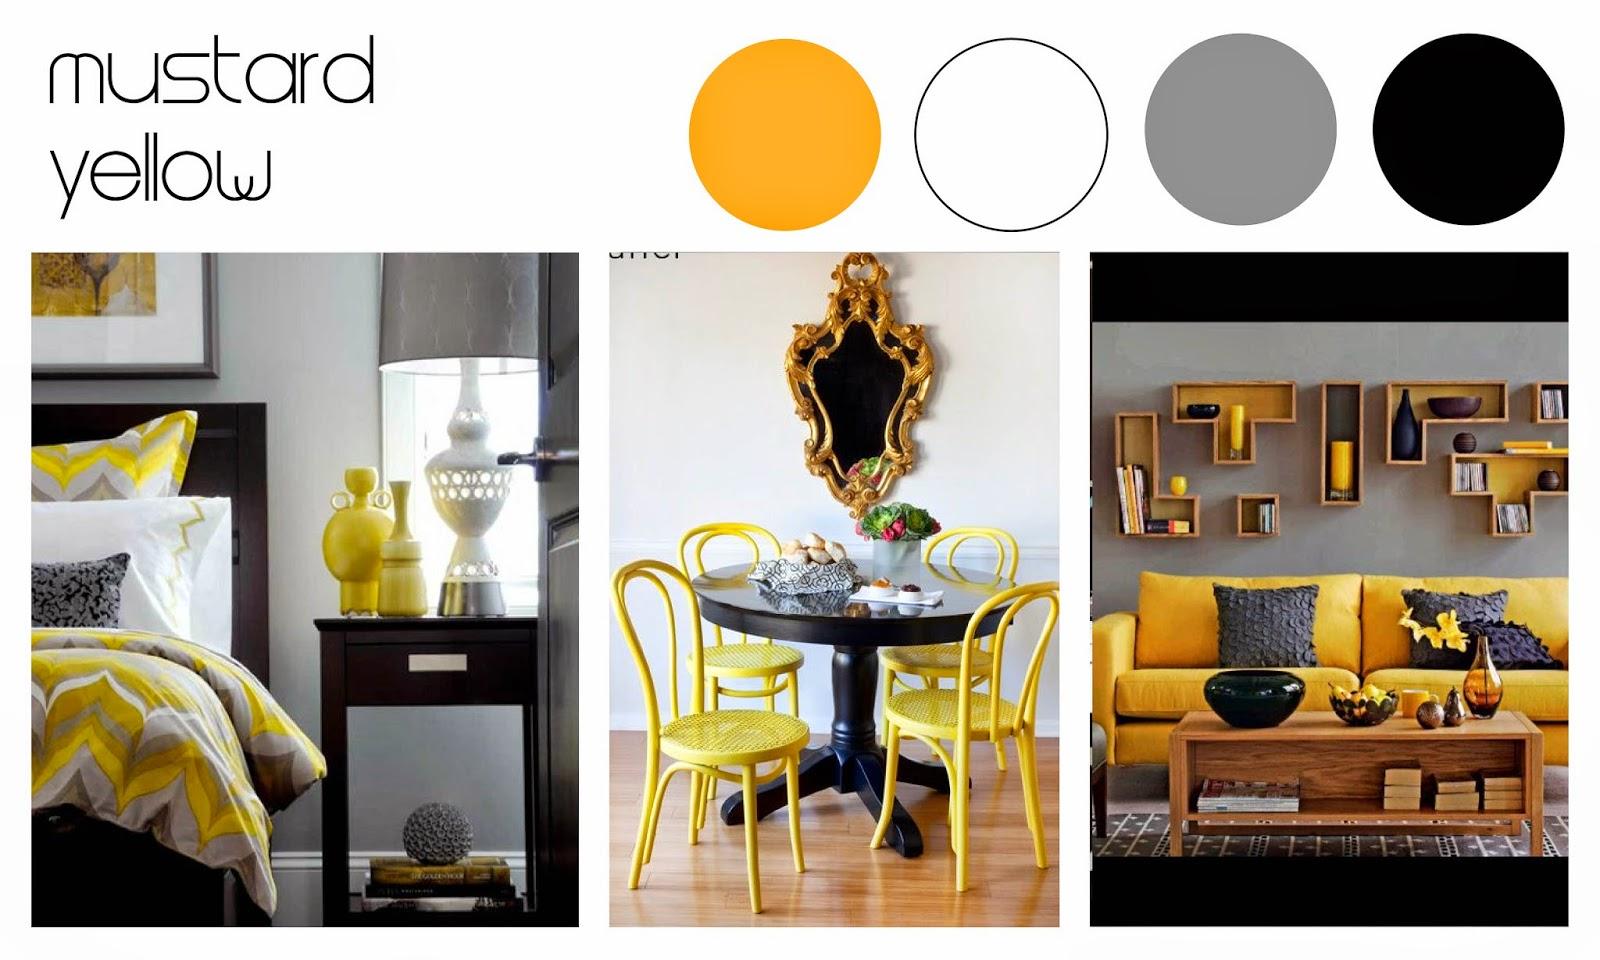 Mustard yellow decor